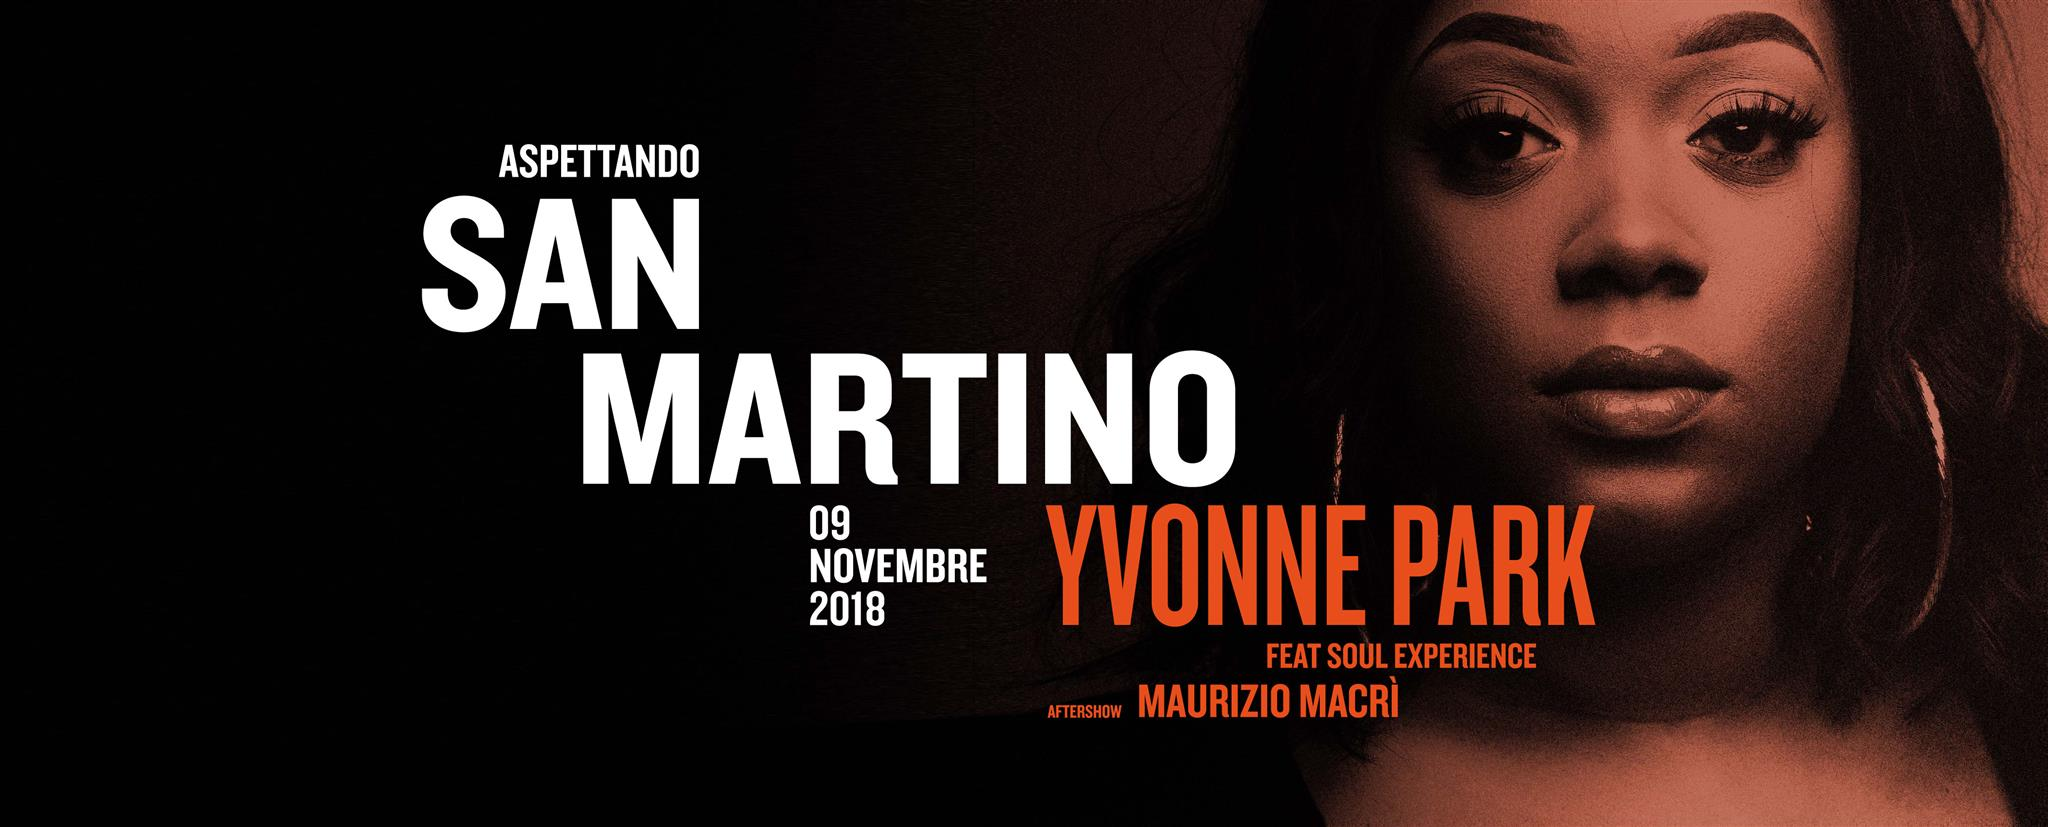 Aspettando San Martino 2018 - Tenute Rubino